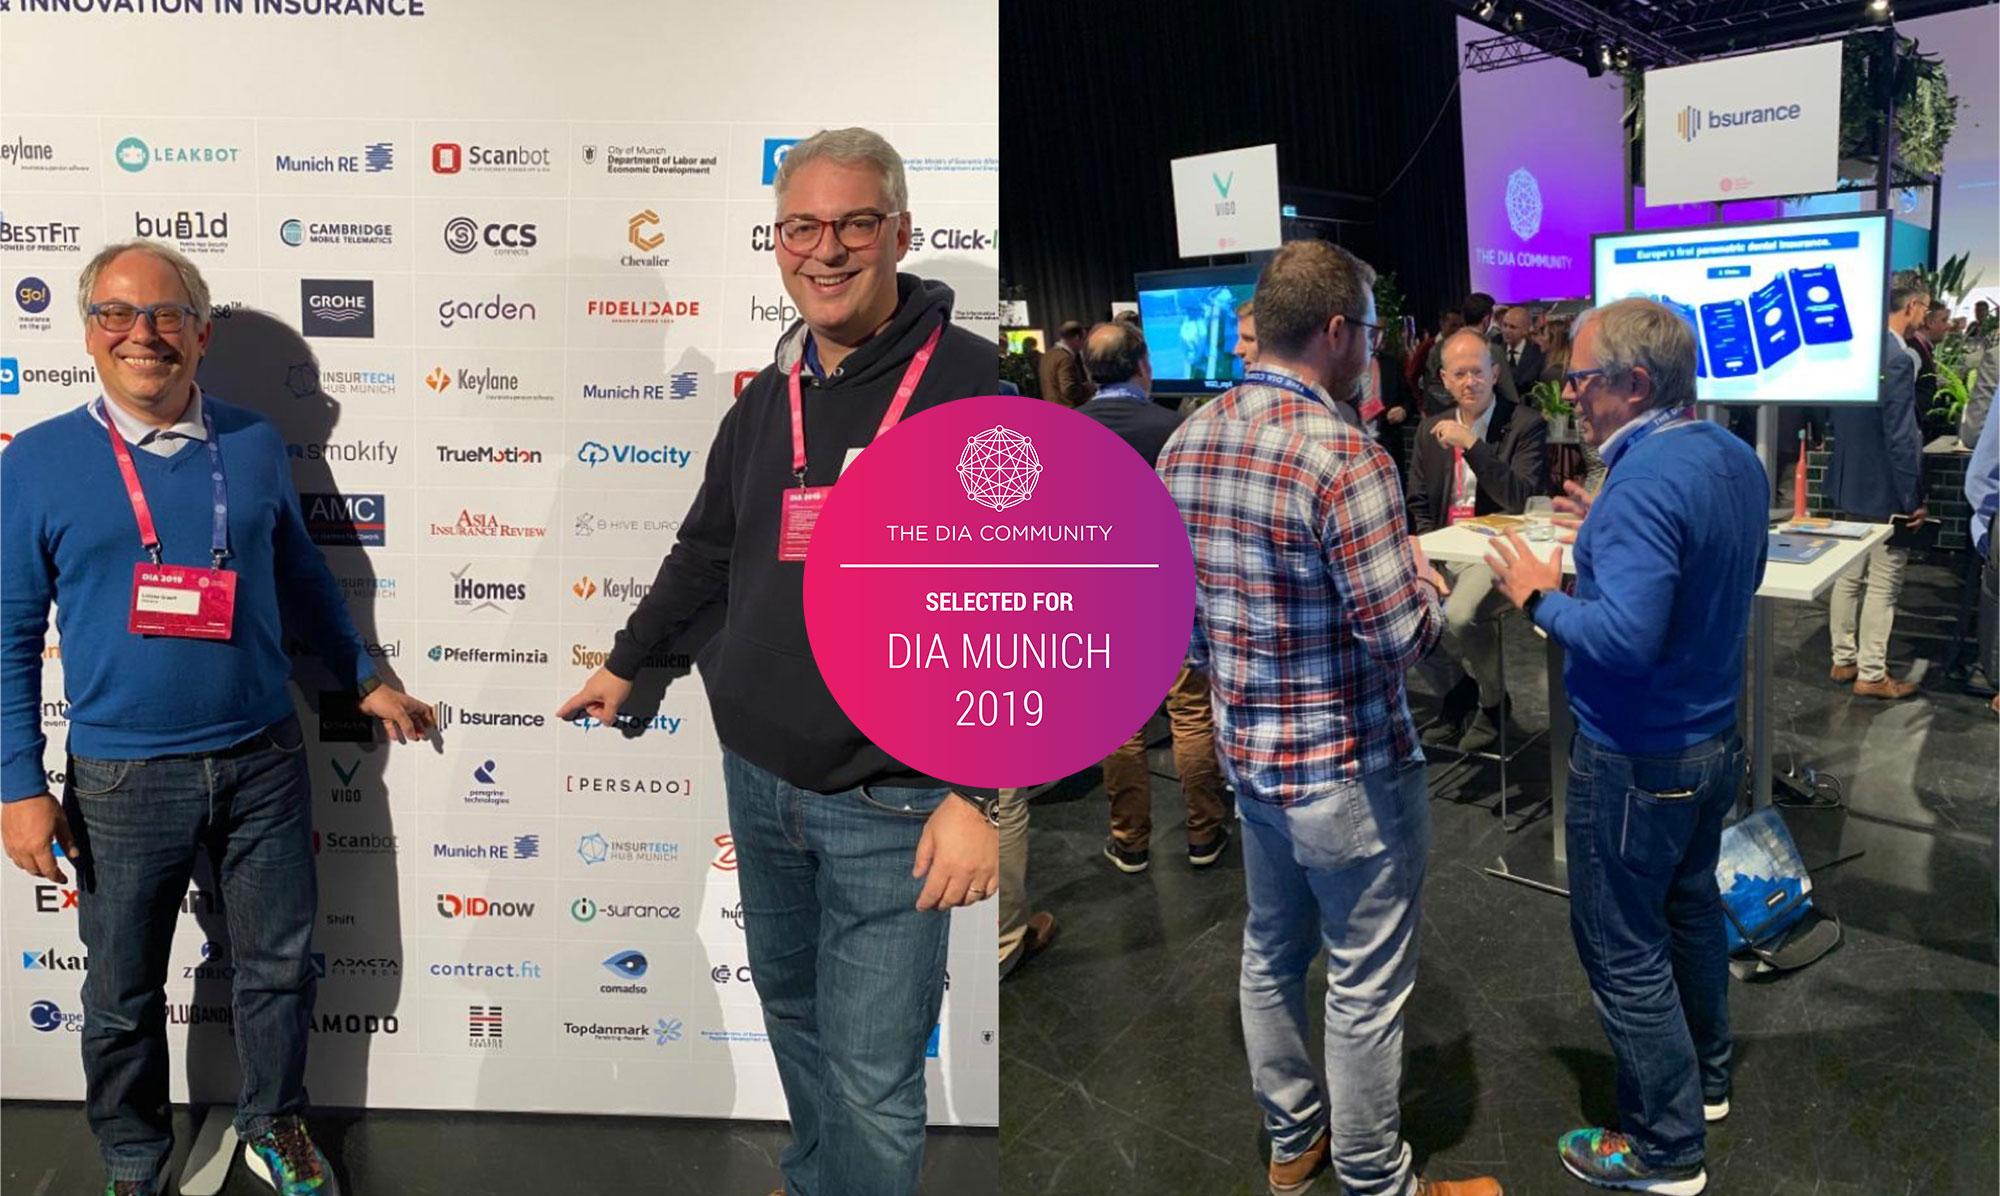 bsurance-Graeff-UNIQA-Ventures-Nemeth-DIA-Munich-2019